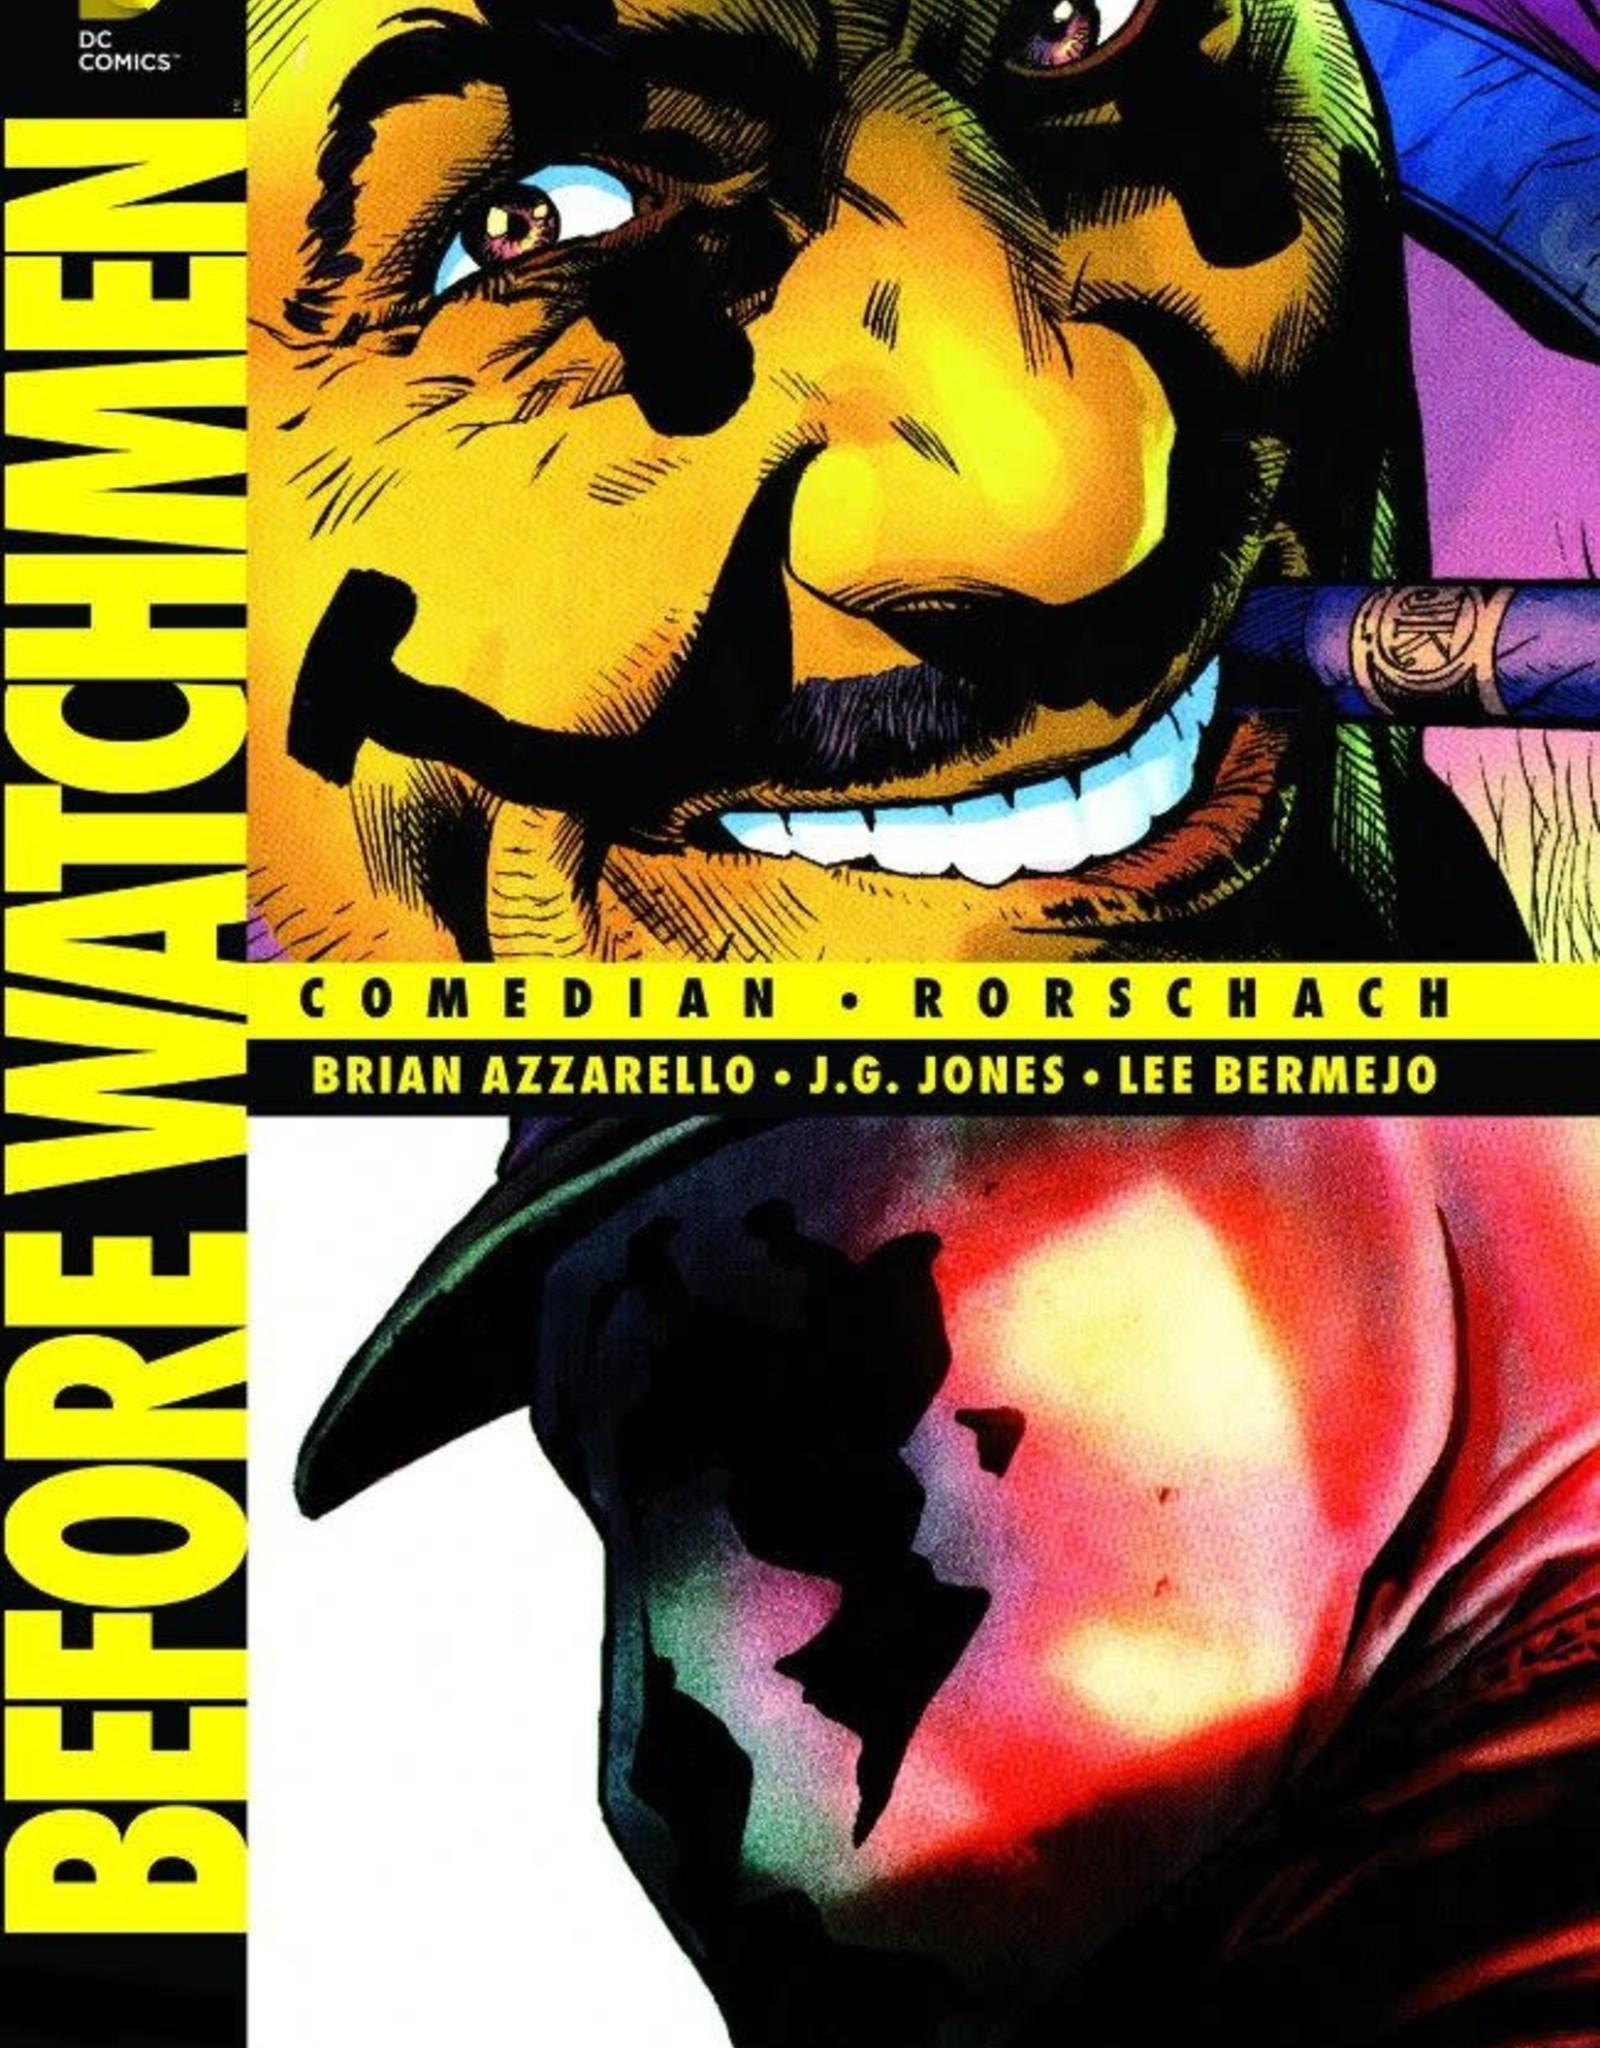 DC Comics Before Watchmen: Comedian/Rorschach TP